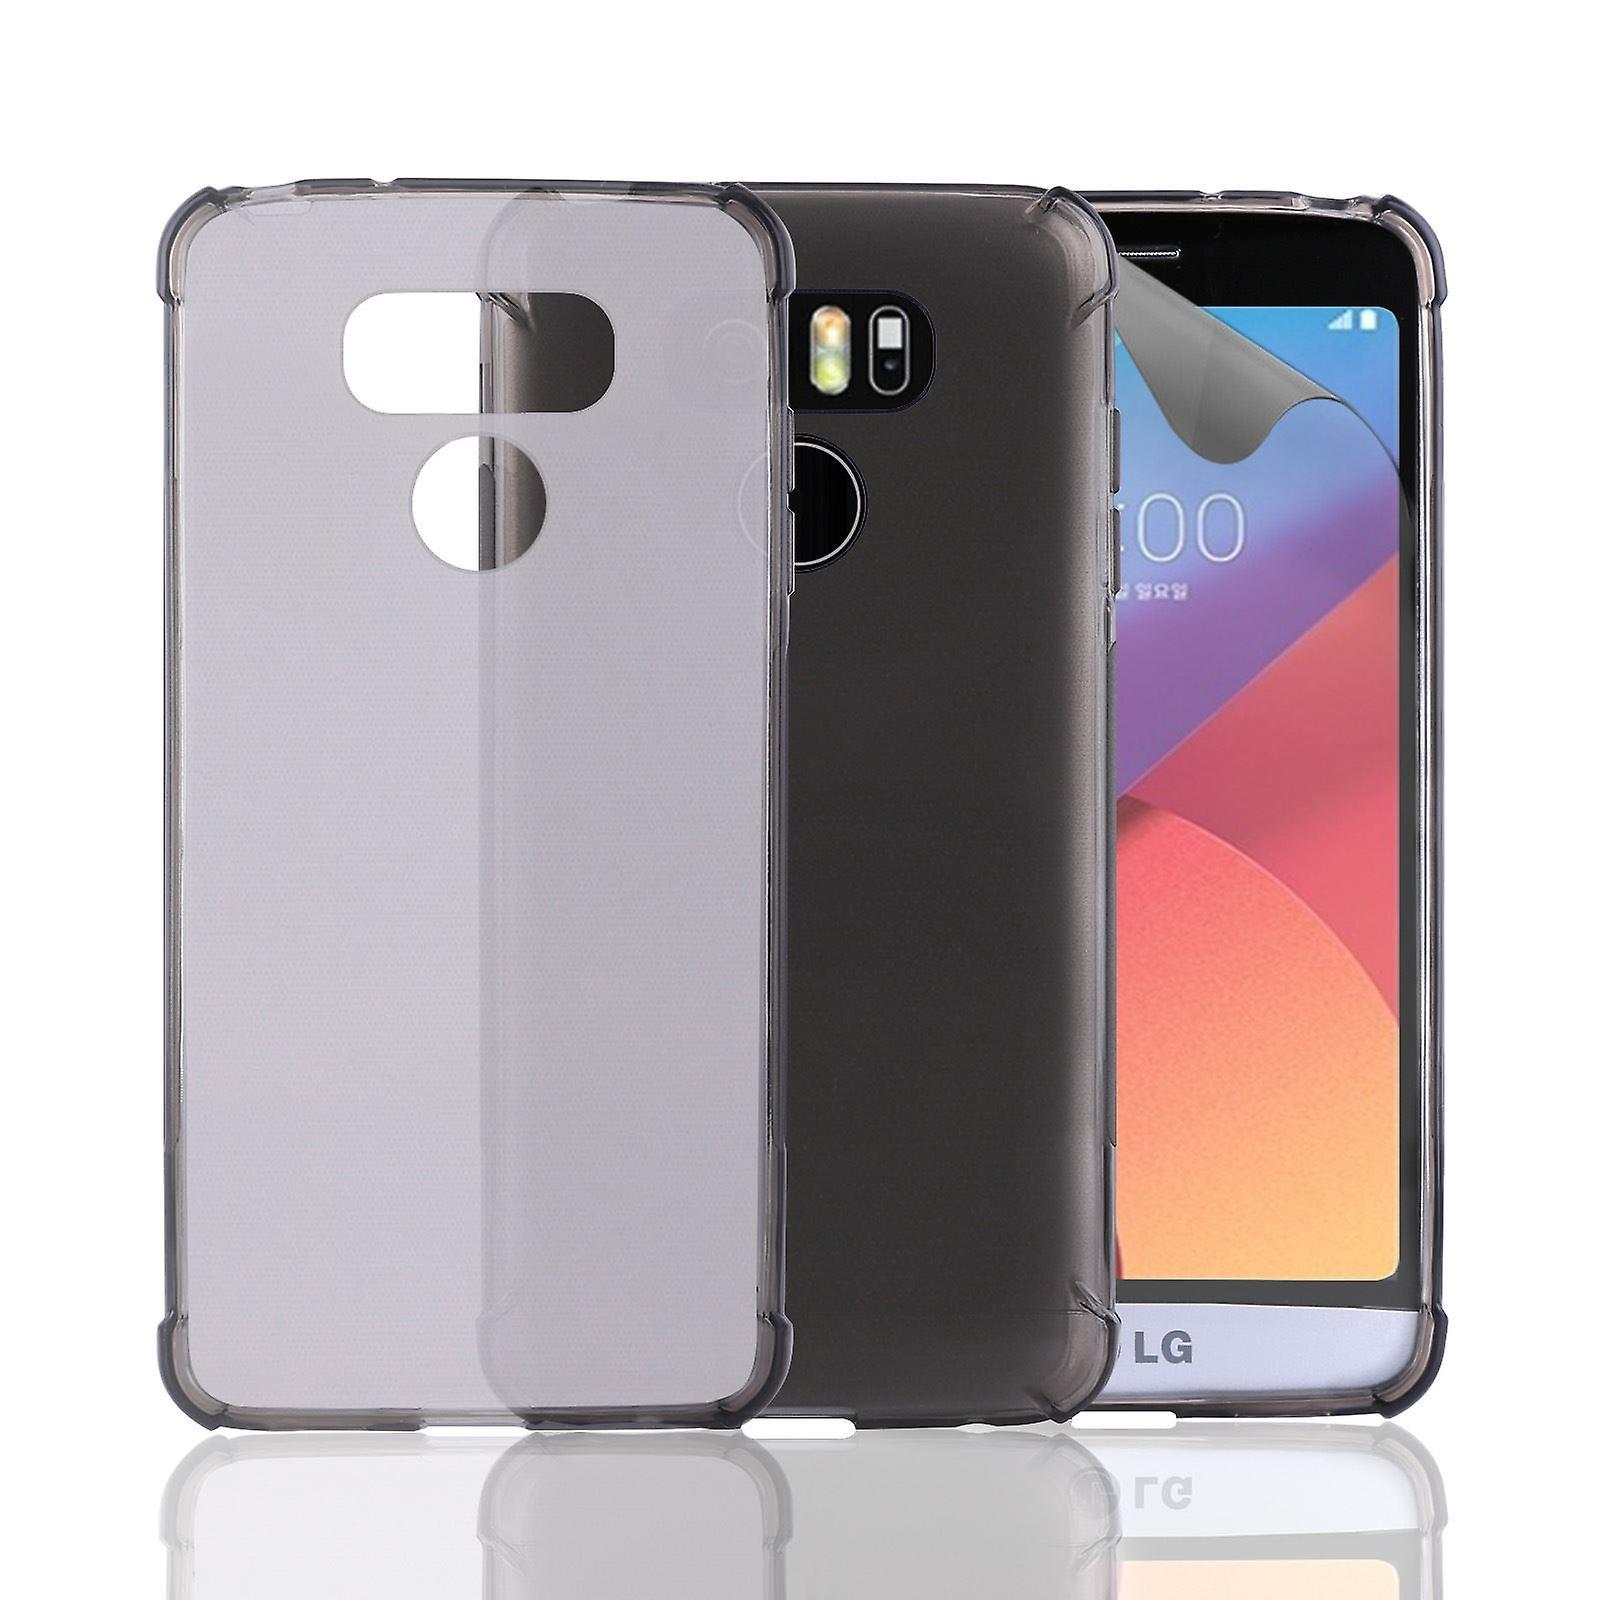 32nd Tough Gel case for LG G6 - Graphite